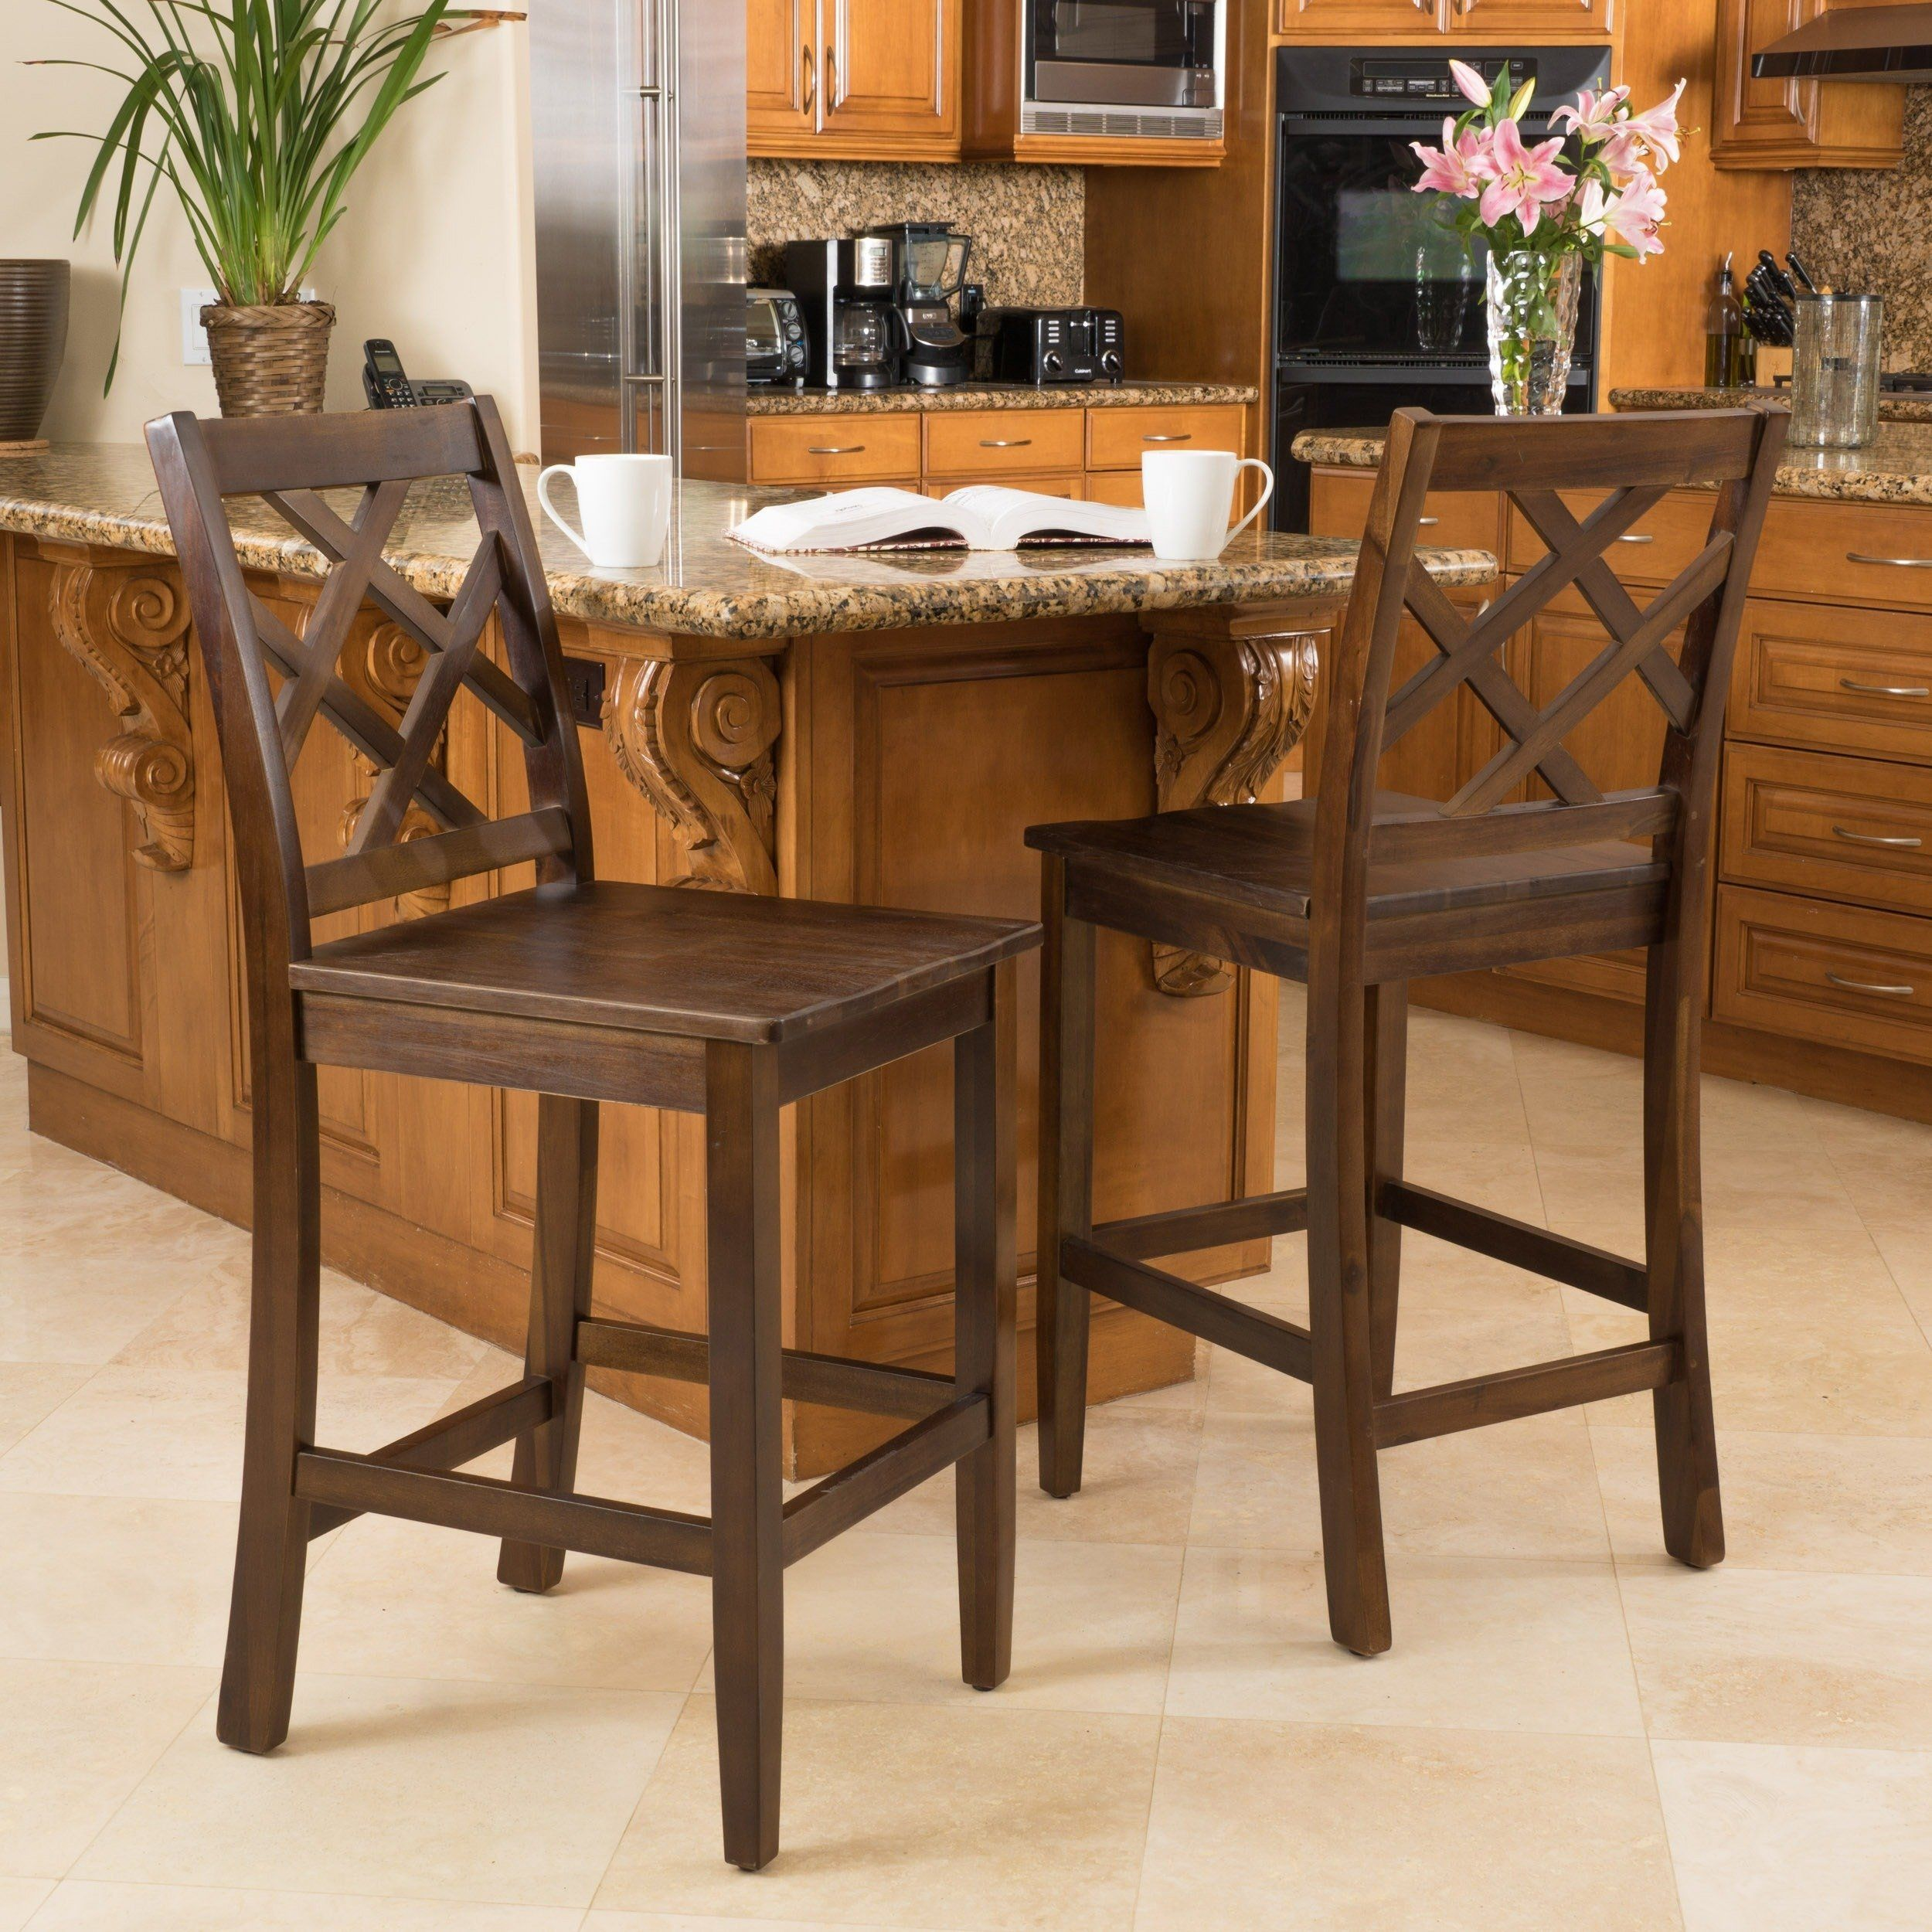 Pleasant Naples Acacia 26 Inch Wood Counter Stool In Brown Set Of 2 Inzonedesignstudio Interior Chair Design Inzonedesignstudiocom